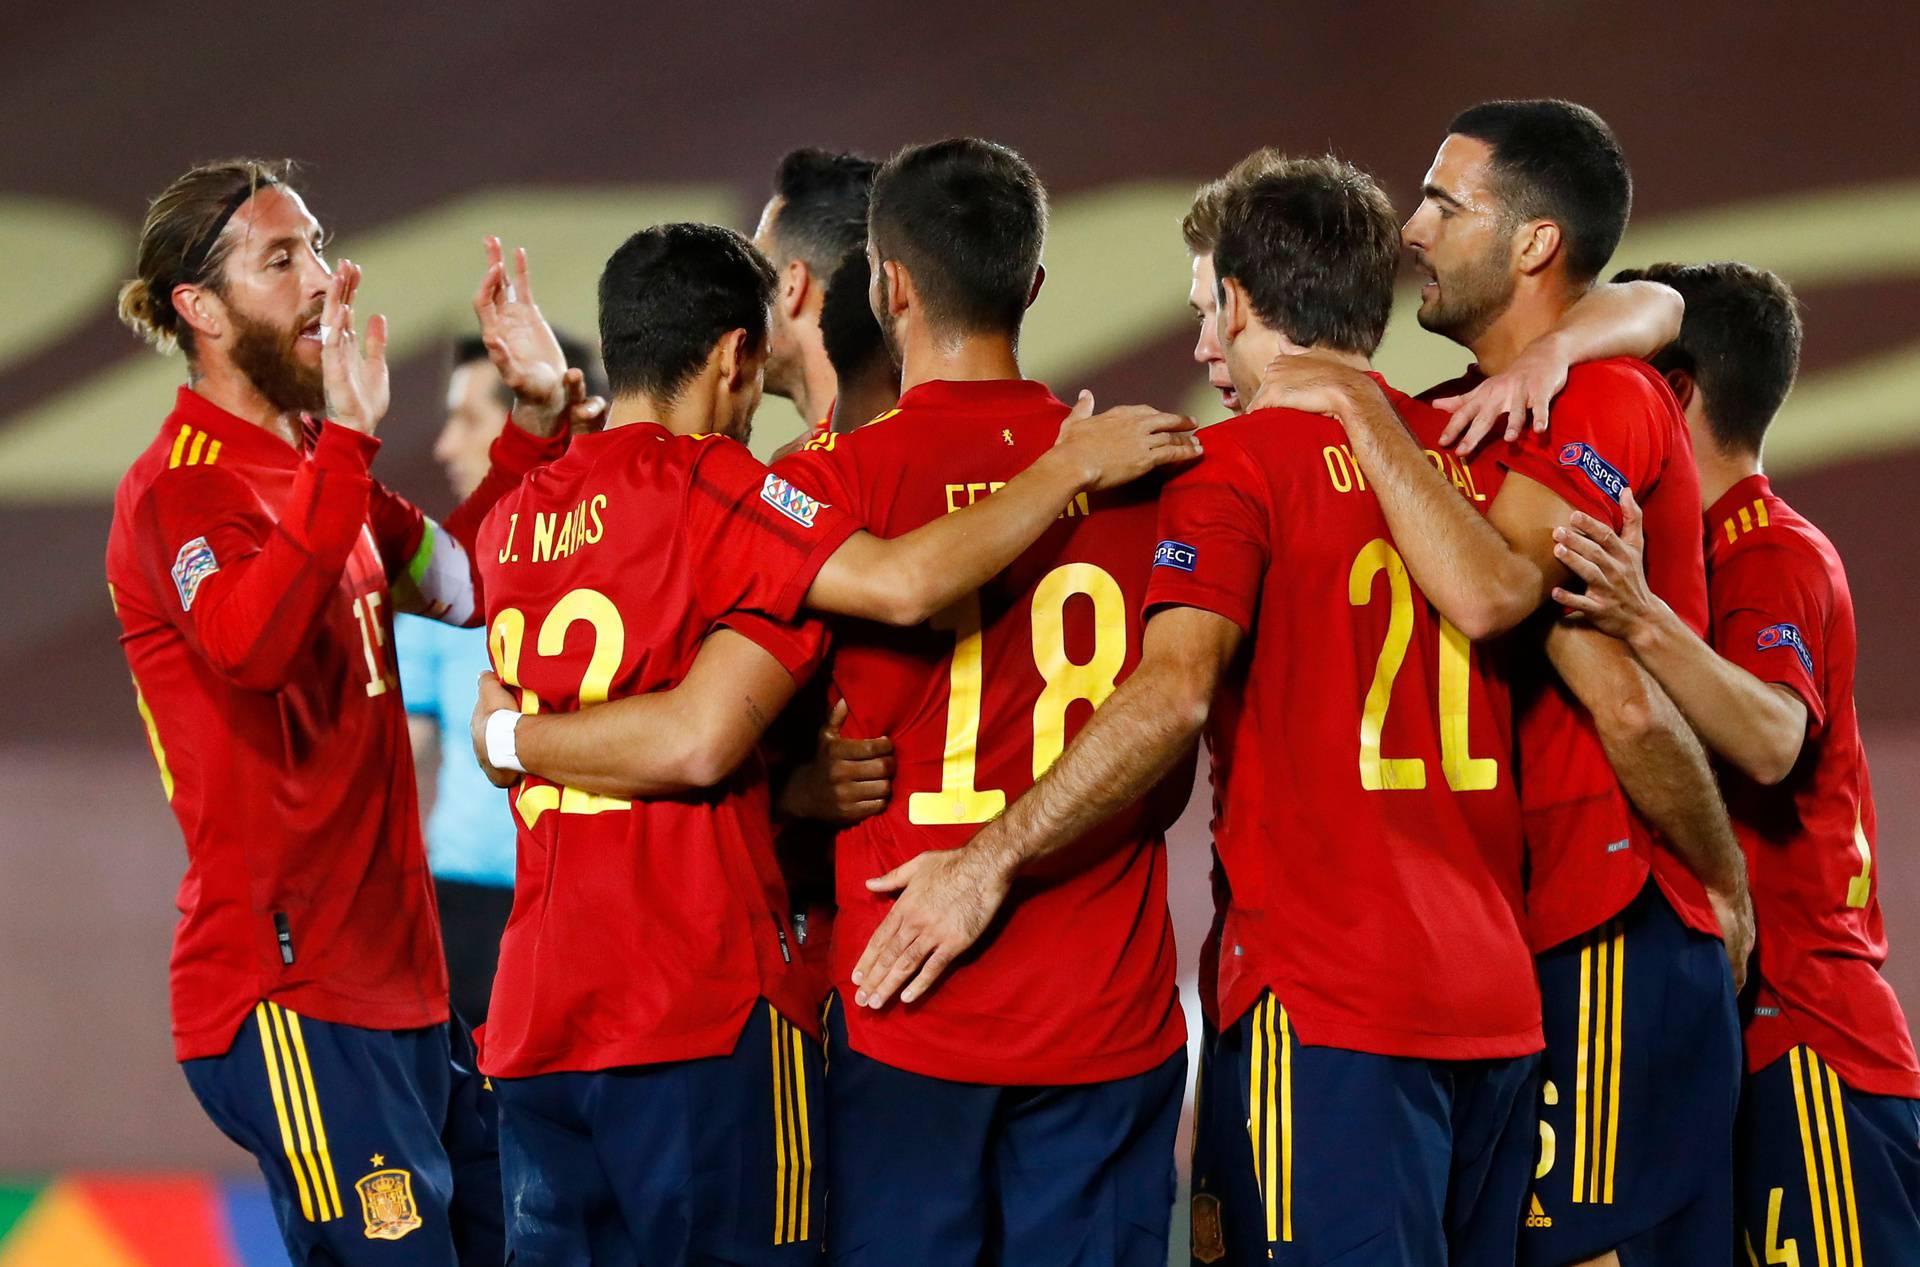 UEFA Nations League - League A - Group 4 - Spain v Switzerland